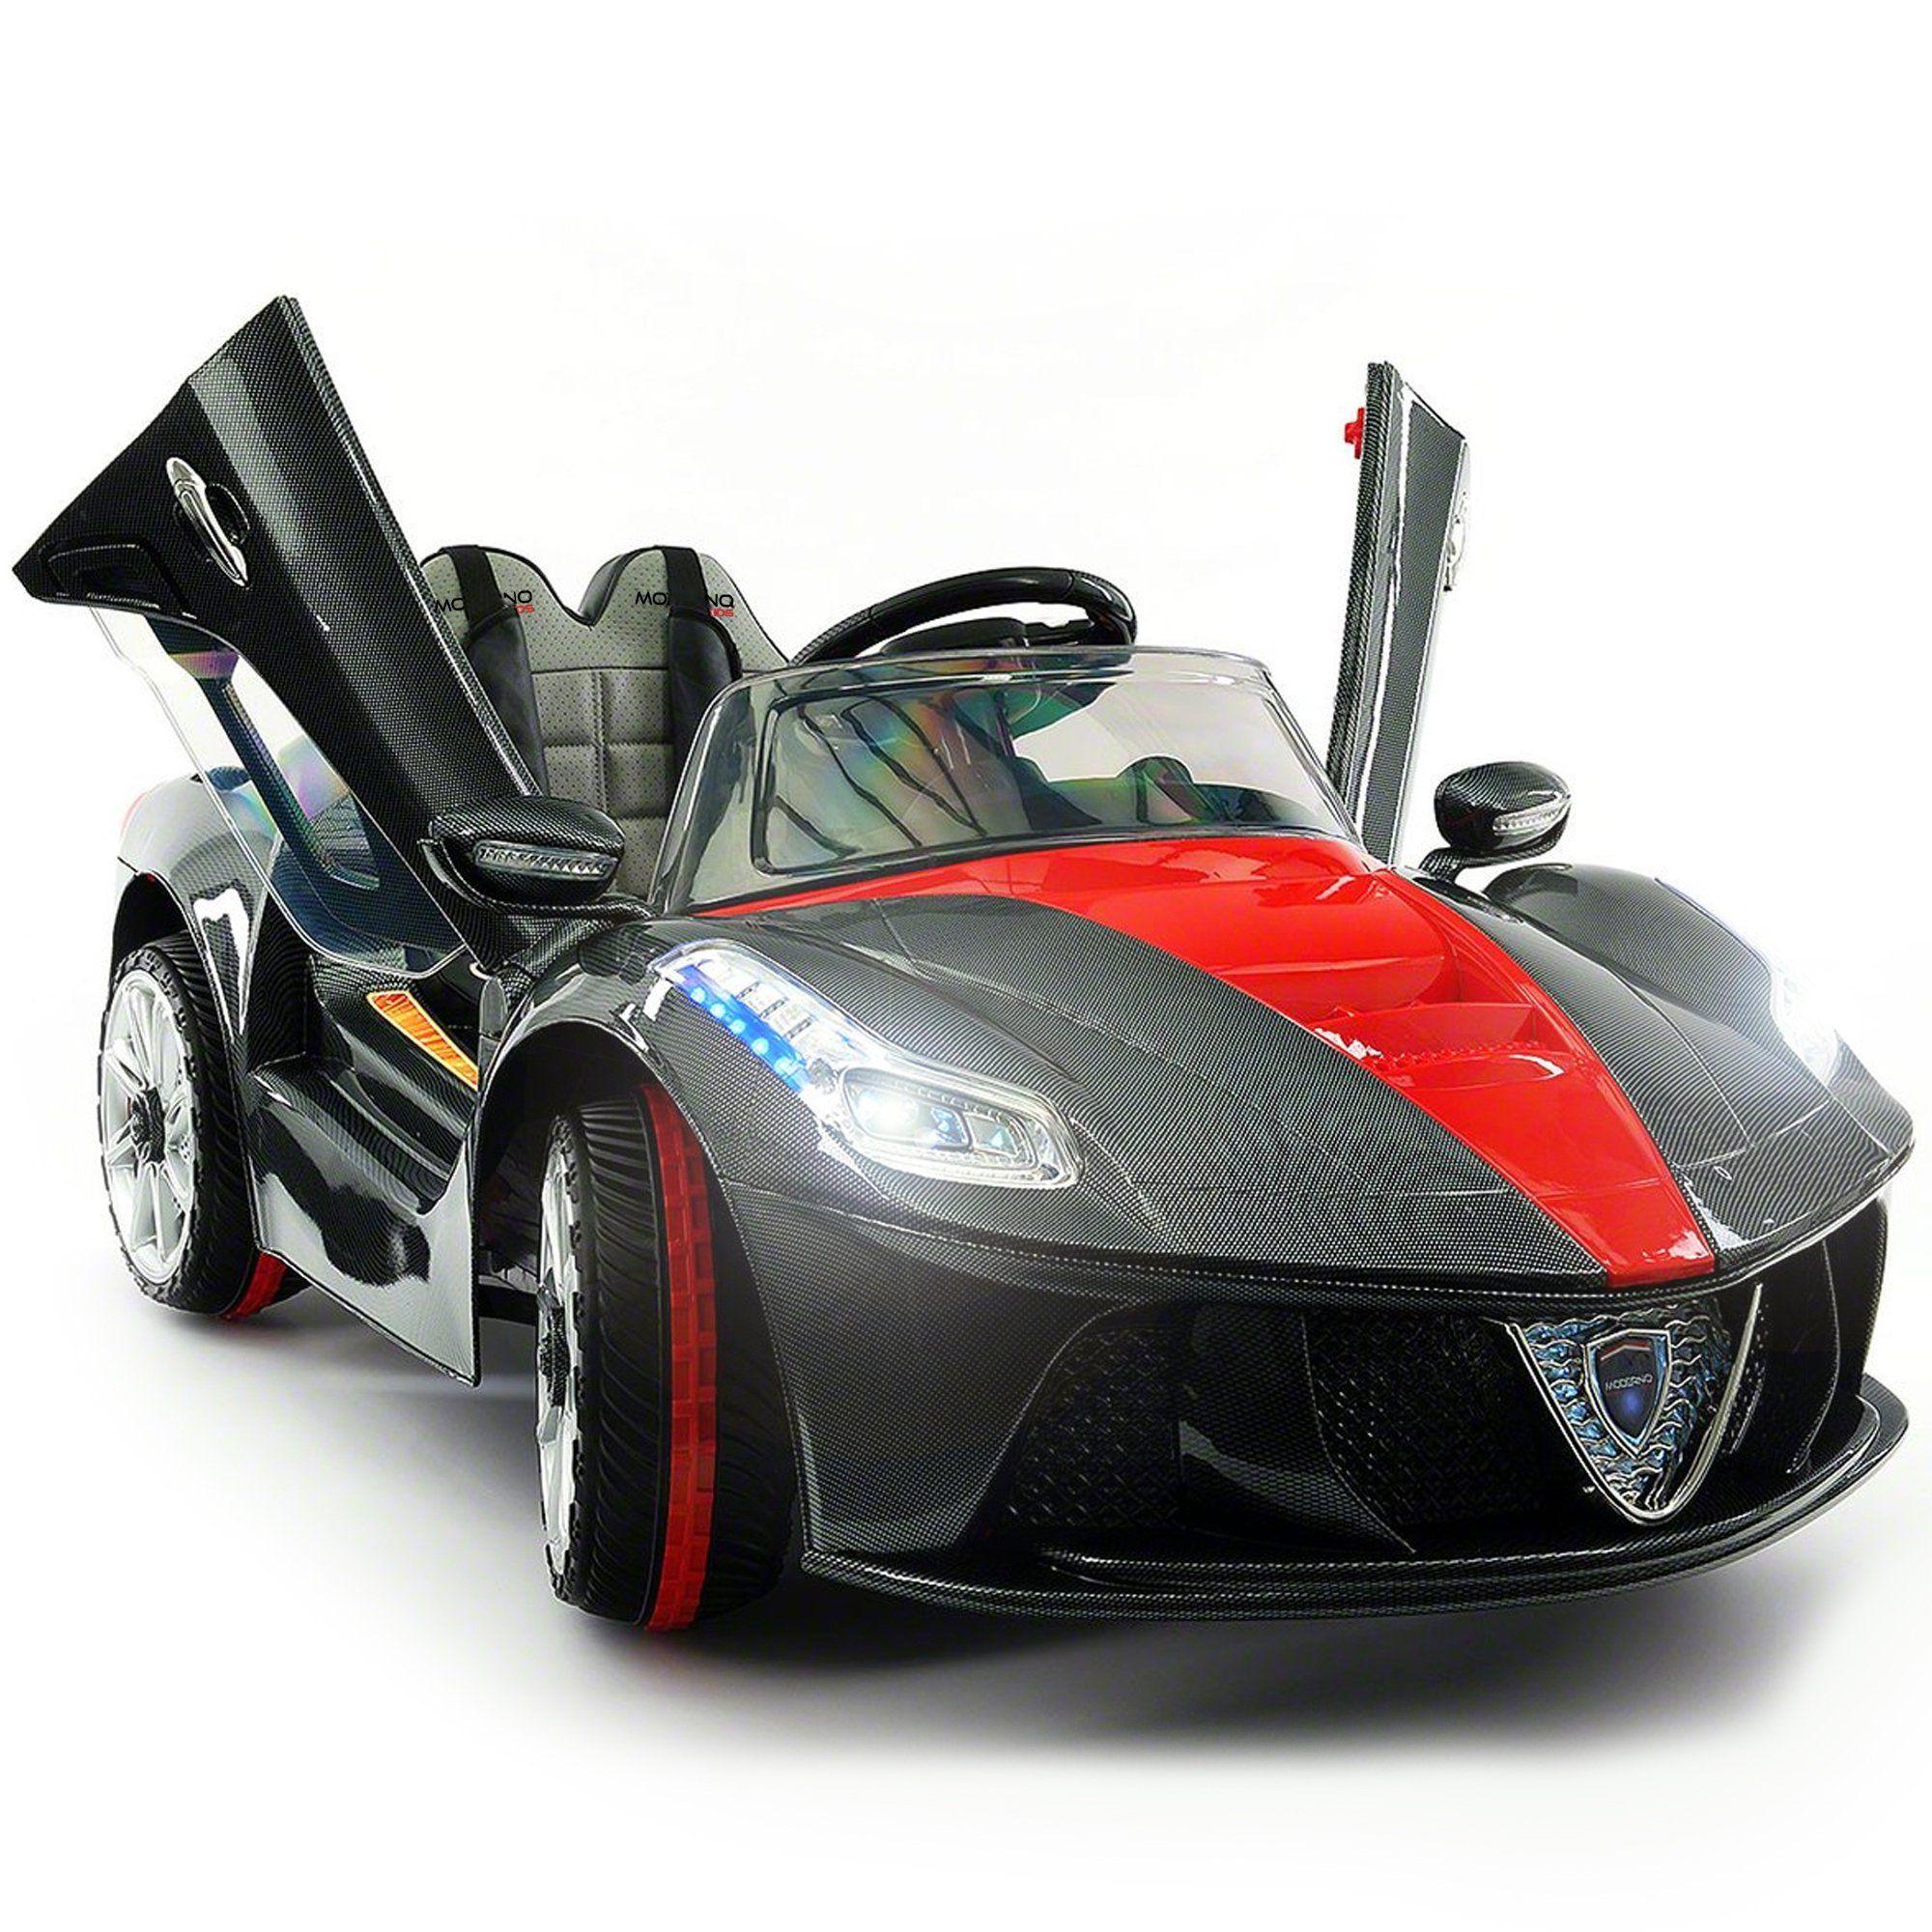 2020 moderno kids 12v sports car battery power ride on toy